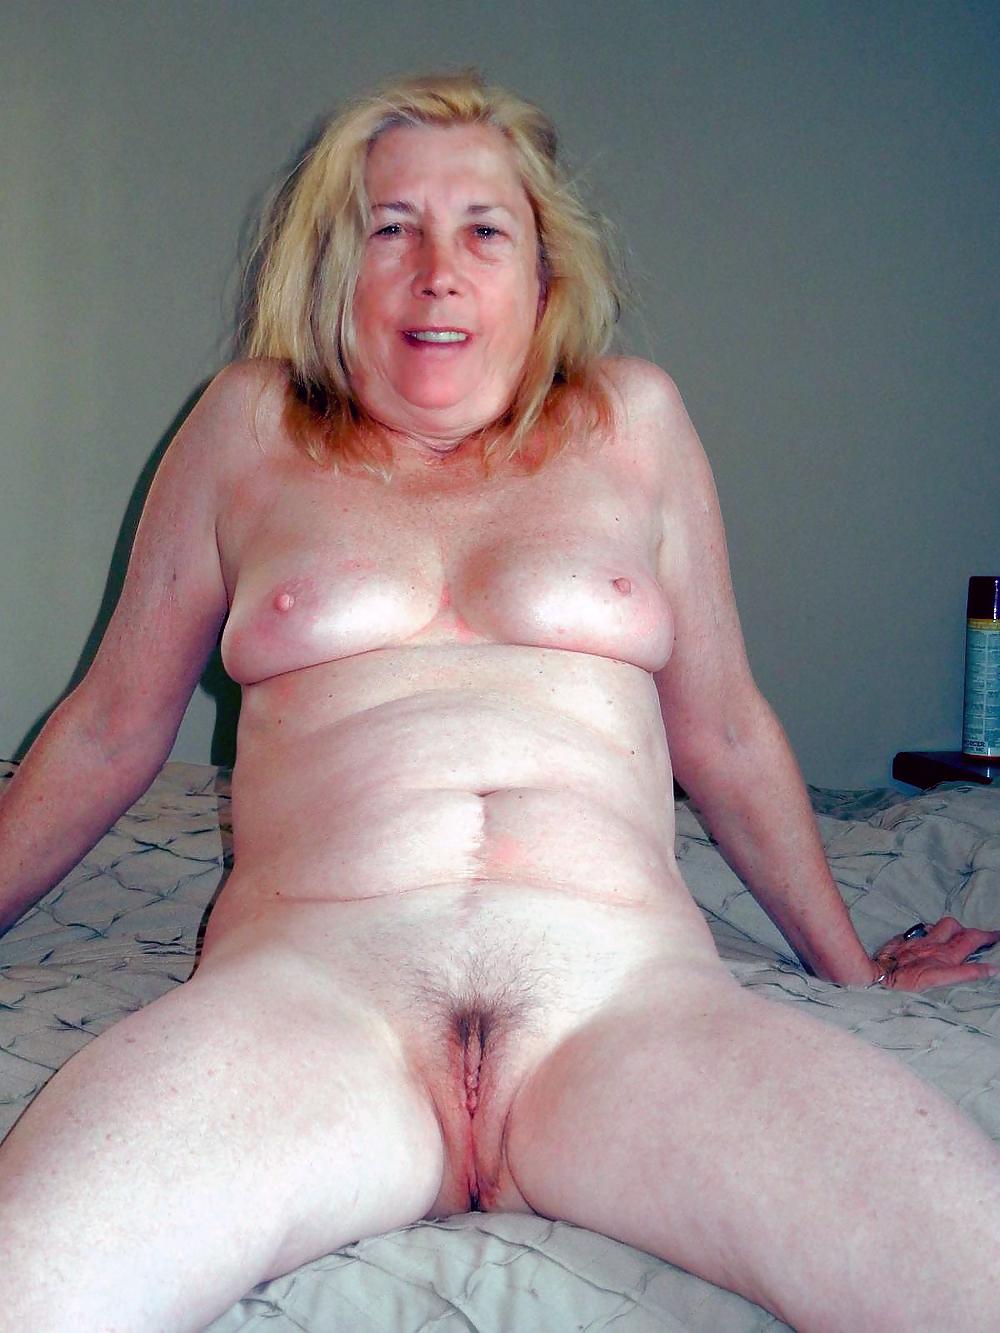 Beautiful Spain girl naked